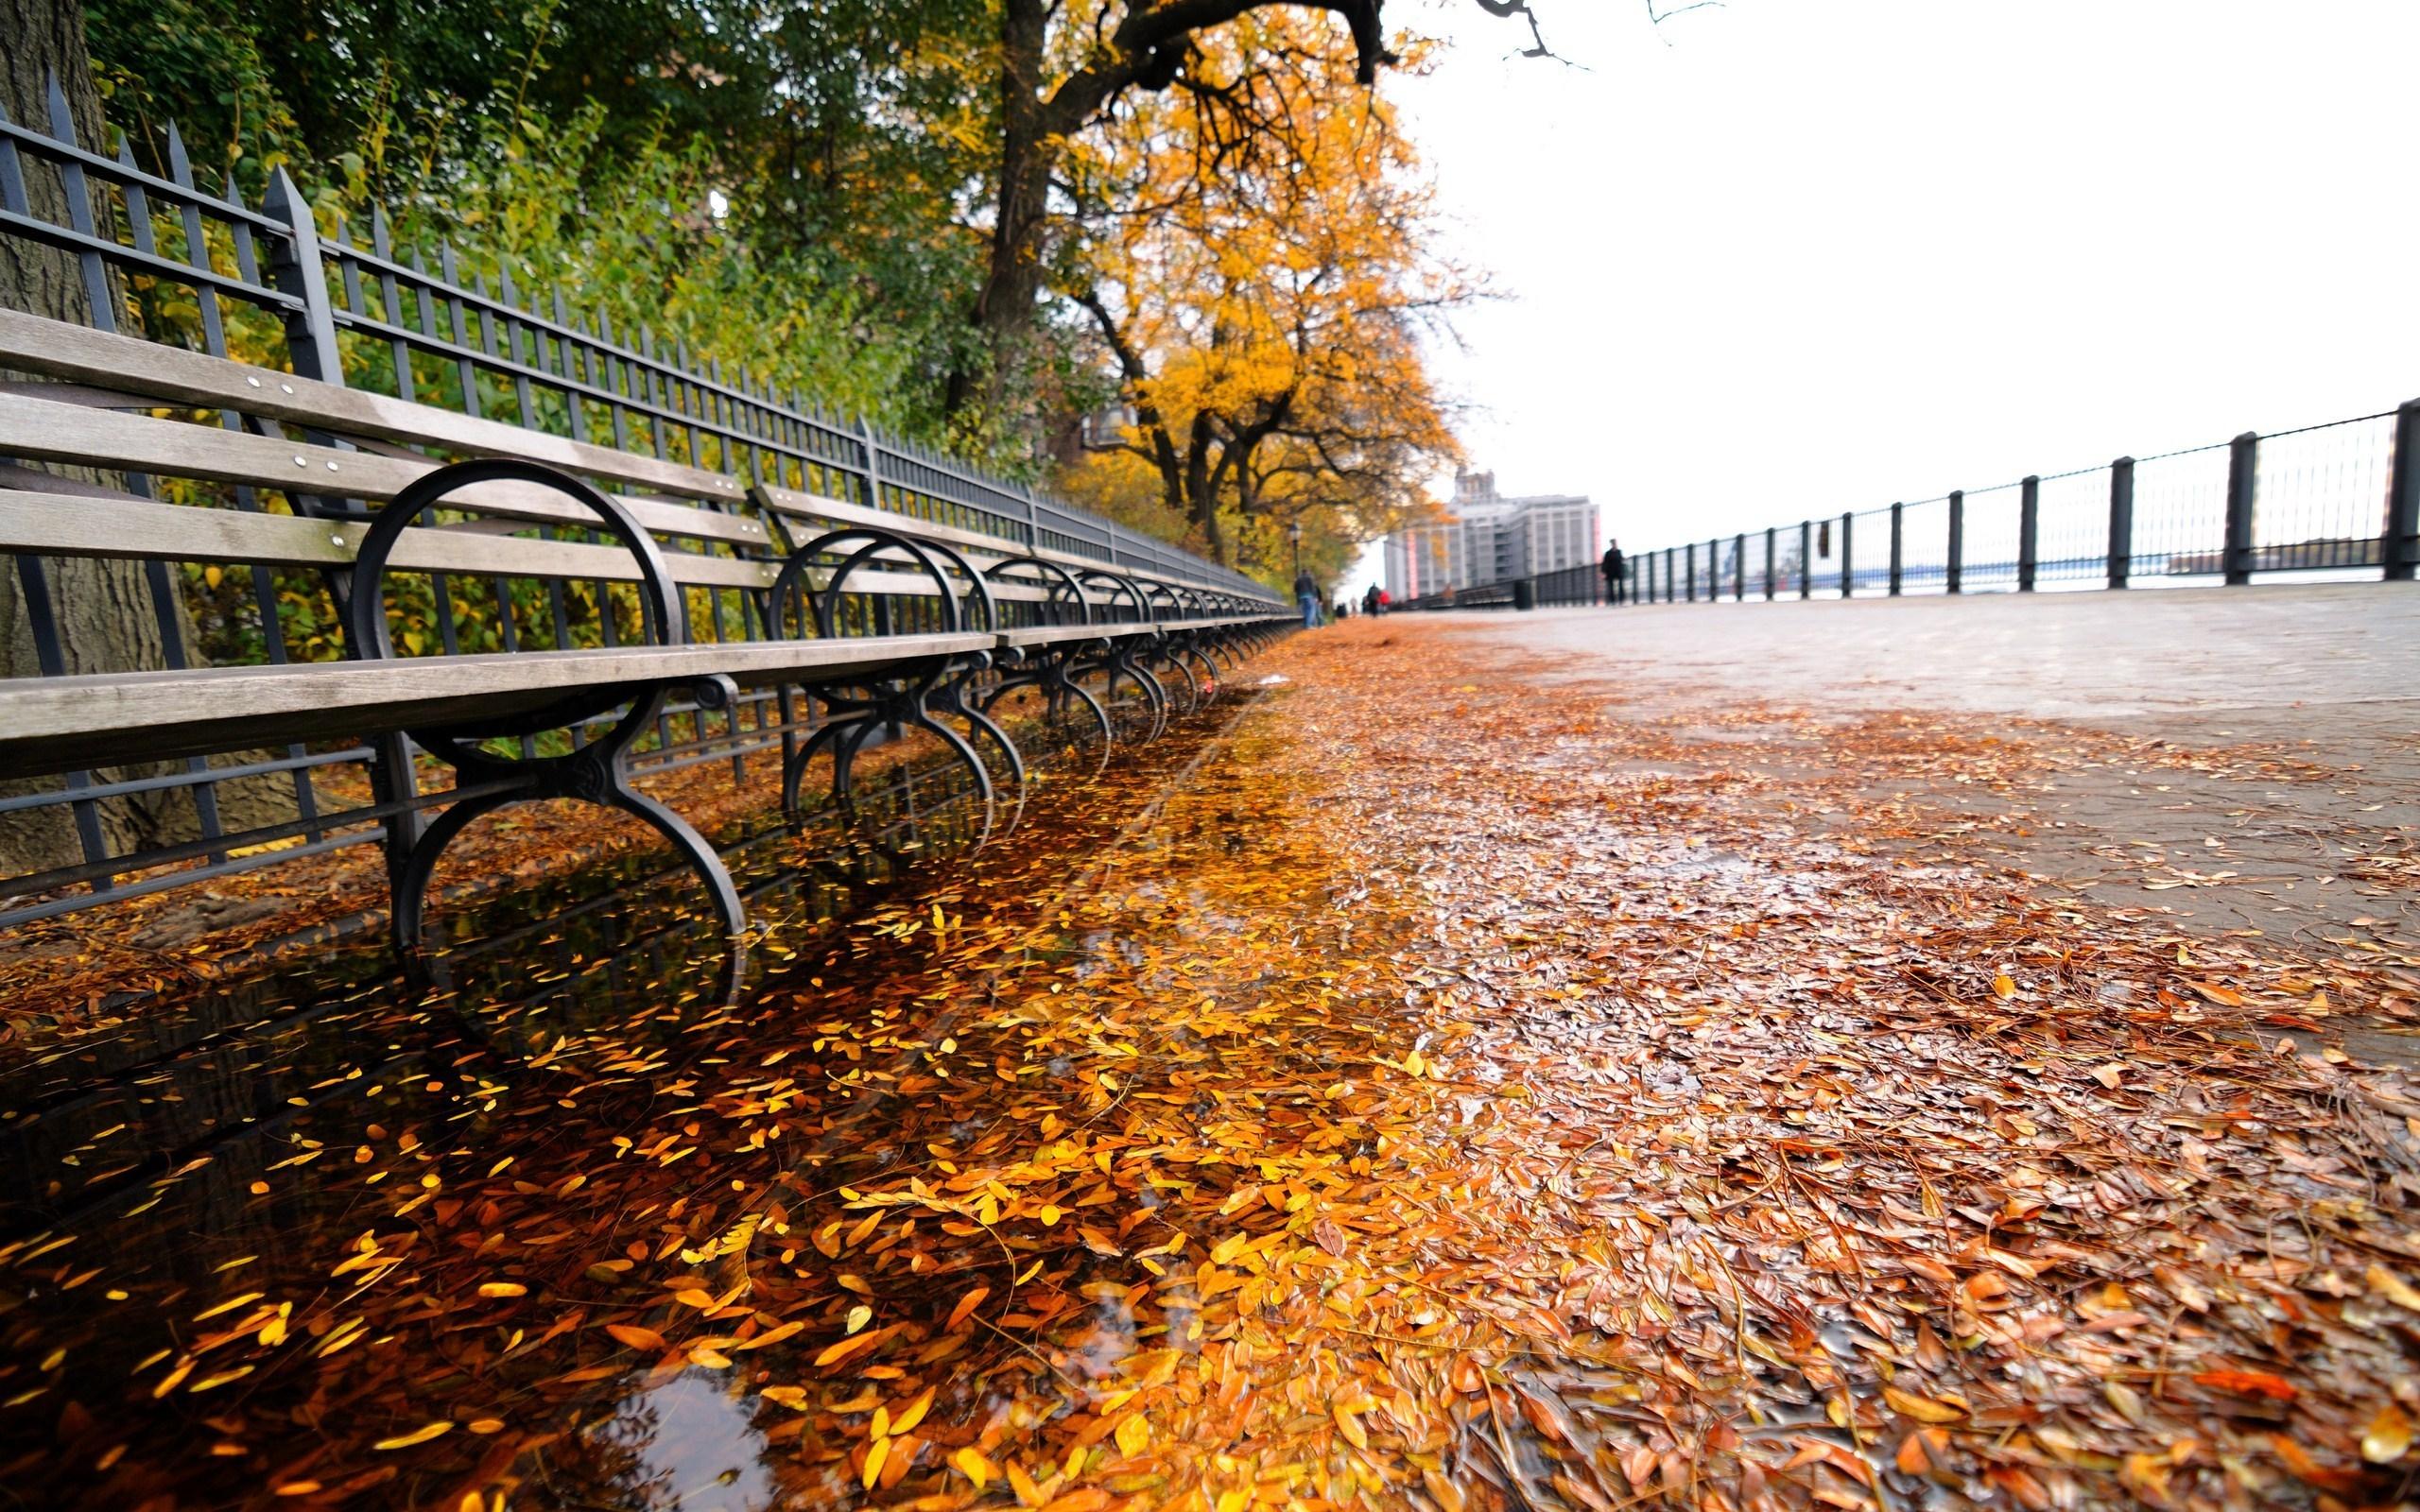 Fall Autumn In New York - HD Wallpaper